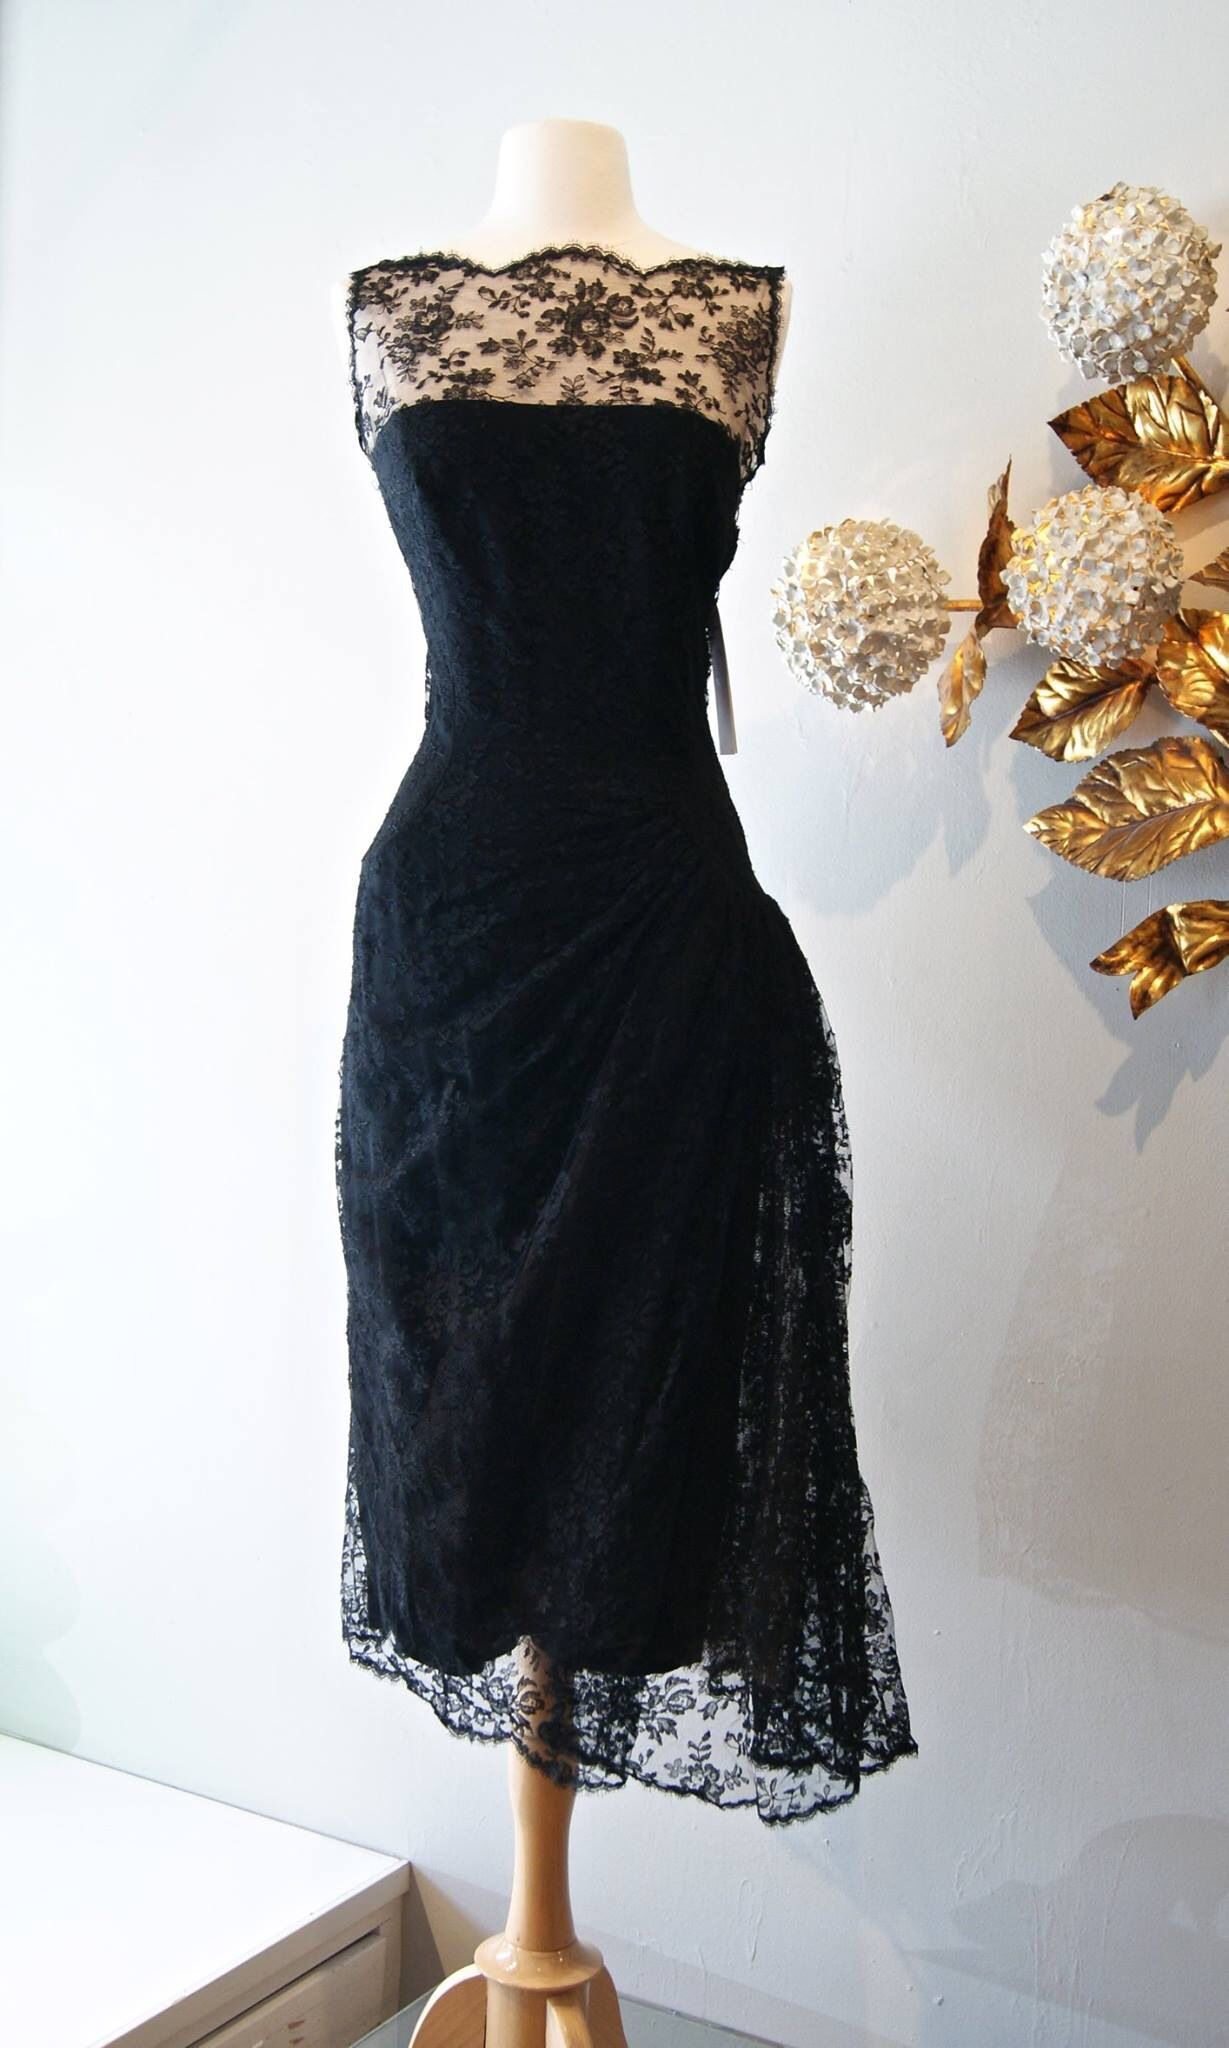 Xatabay boutique dress